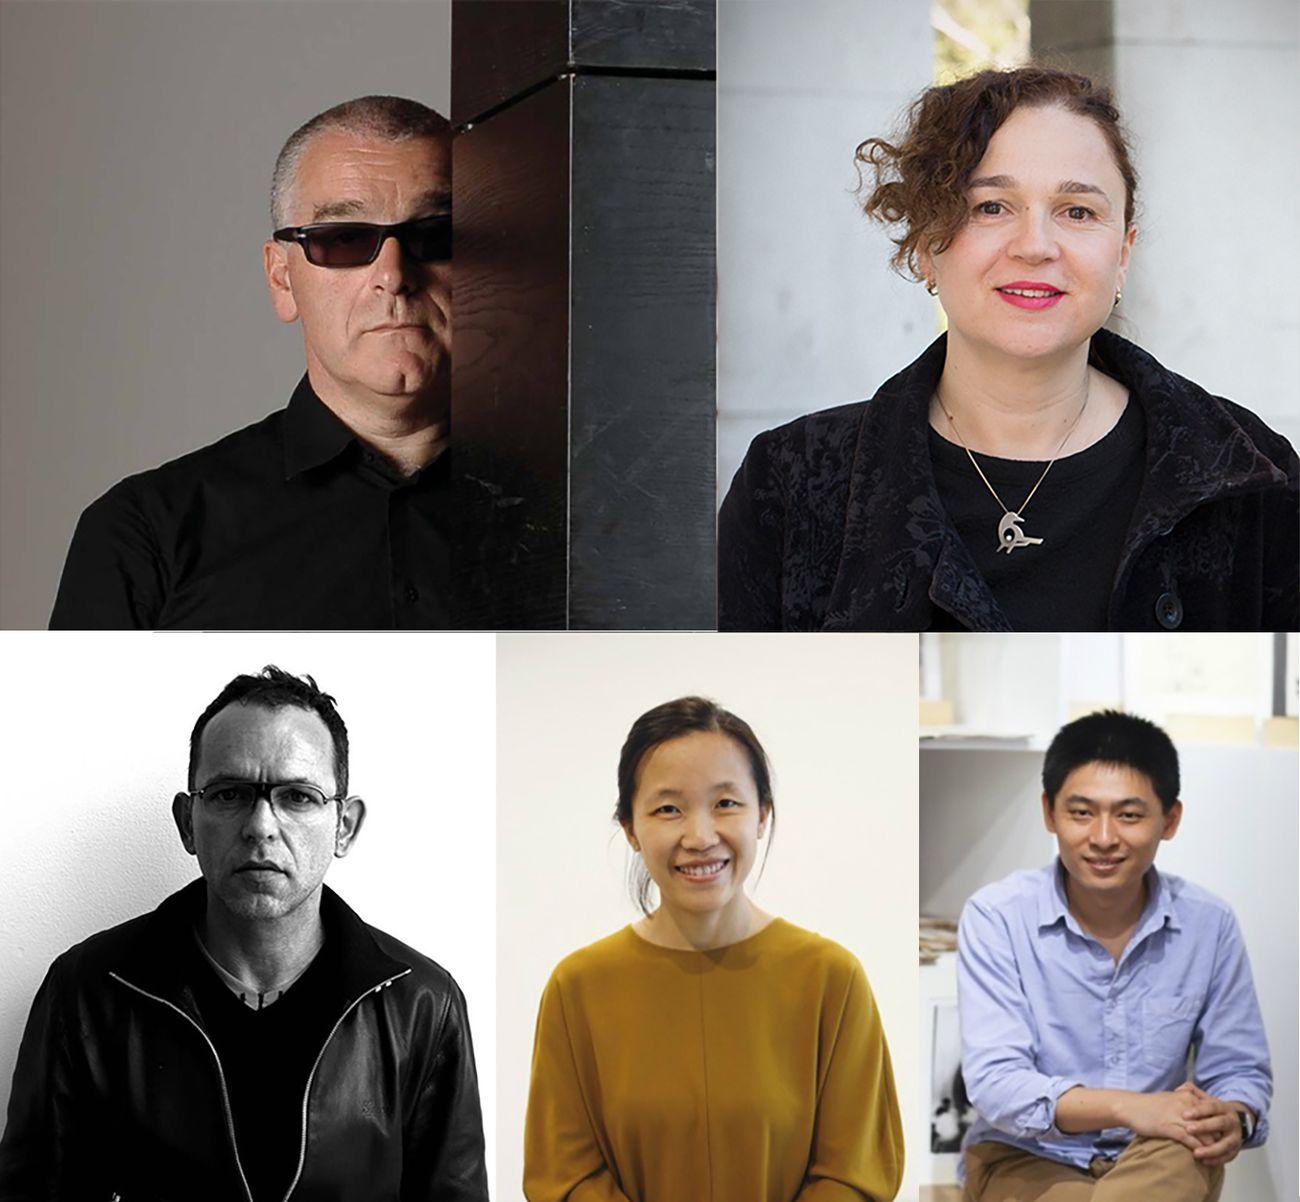 Curatori selezionatori di Blackout Book. Da sx in alto, Marco Scotini, Ana Devic (WHW), Pierre Bal Blanc, Carol Yinghua Lu, Liu Ding